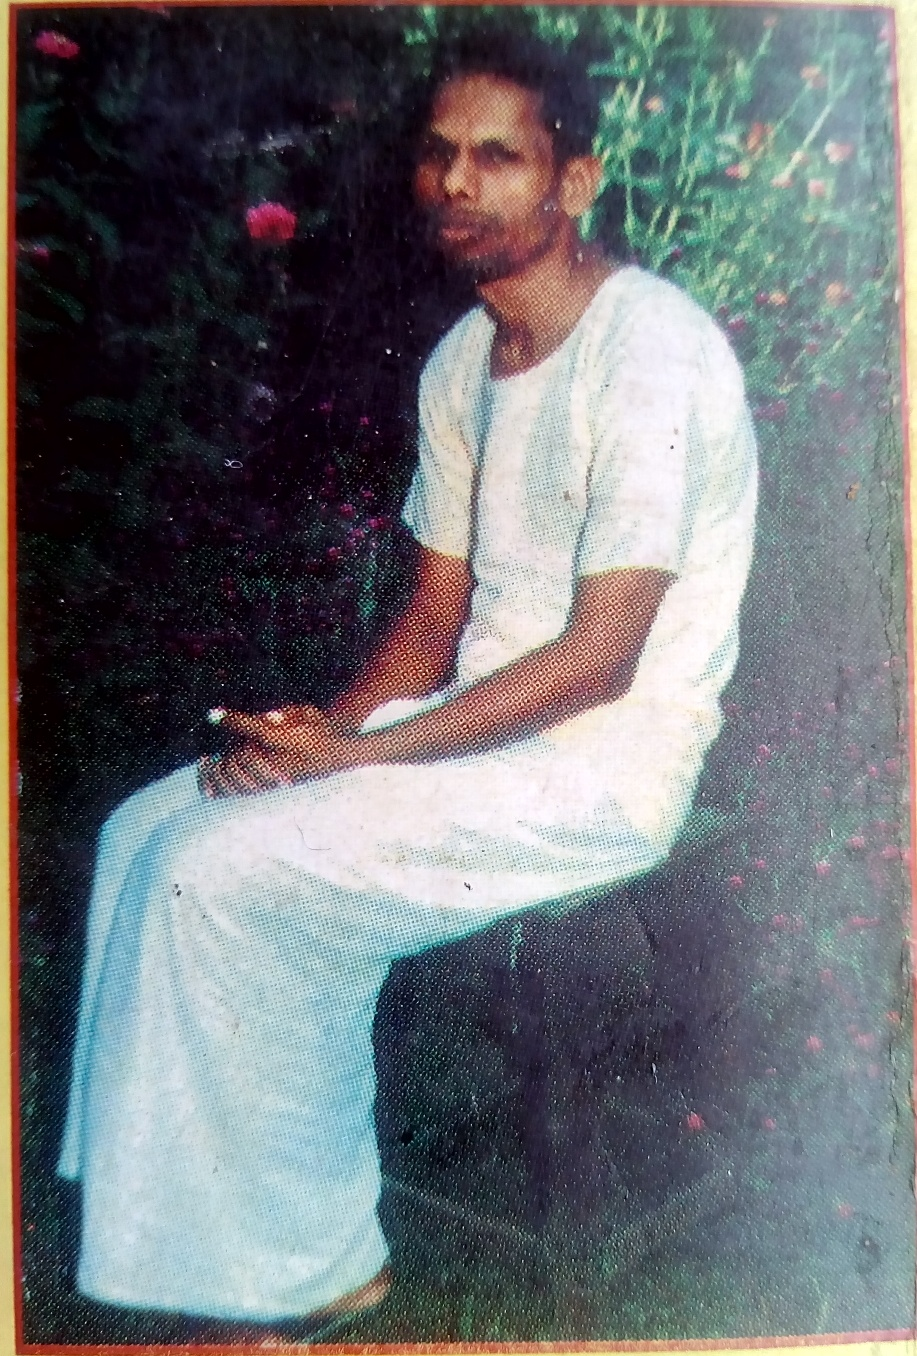 पूज्य पाद लाल दास जी महाराज का संक्षिप्त परिचय।Brief introduction of Pujya Padal Lal Das Ji Maharaj. पूज्य पाद लाल दास जी महाराज